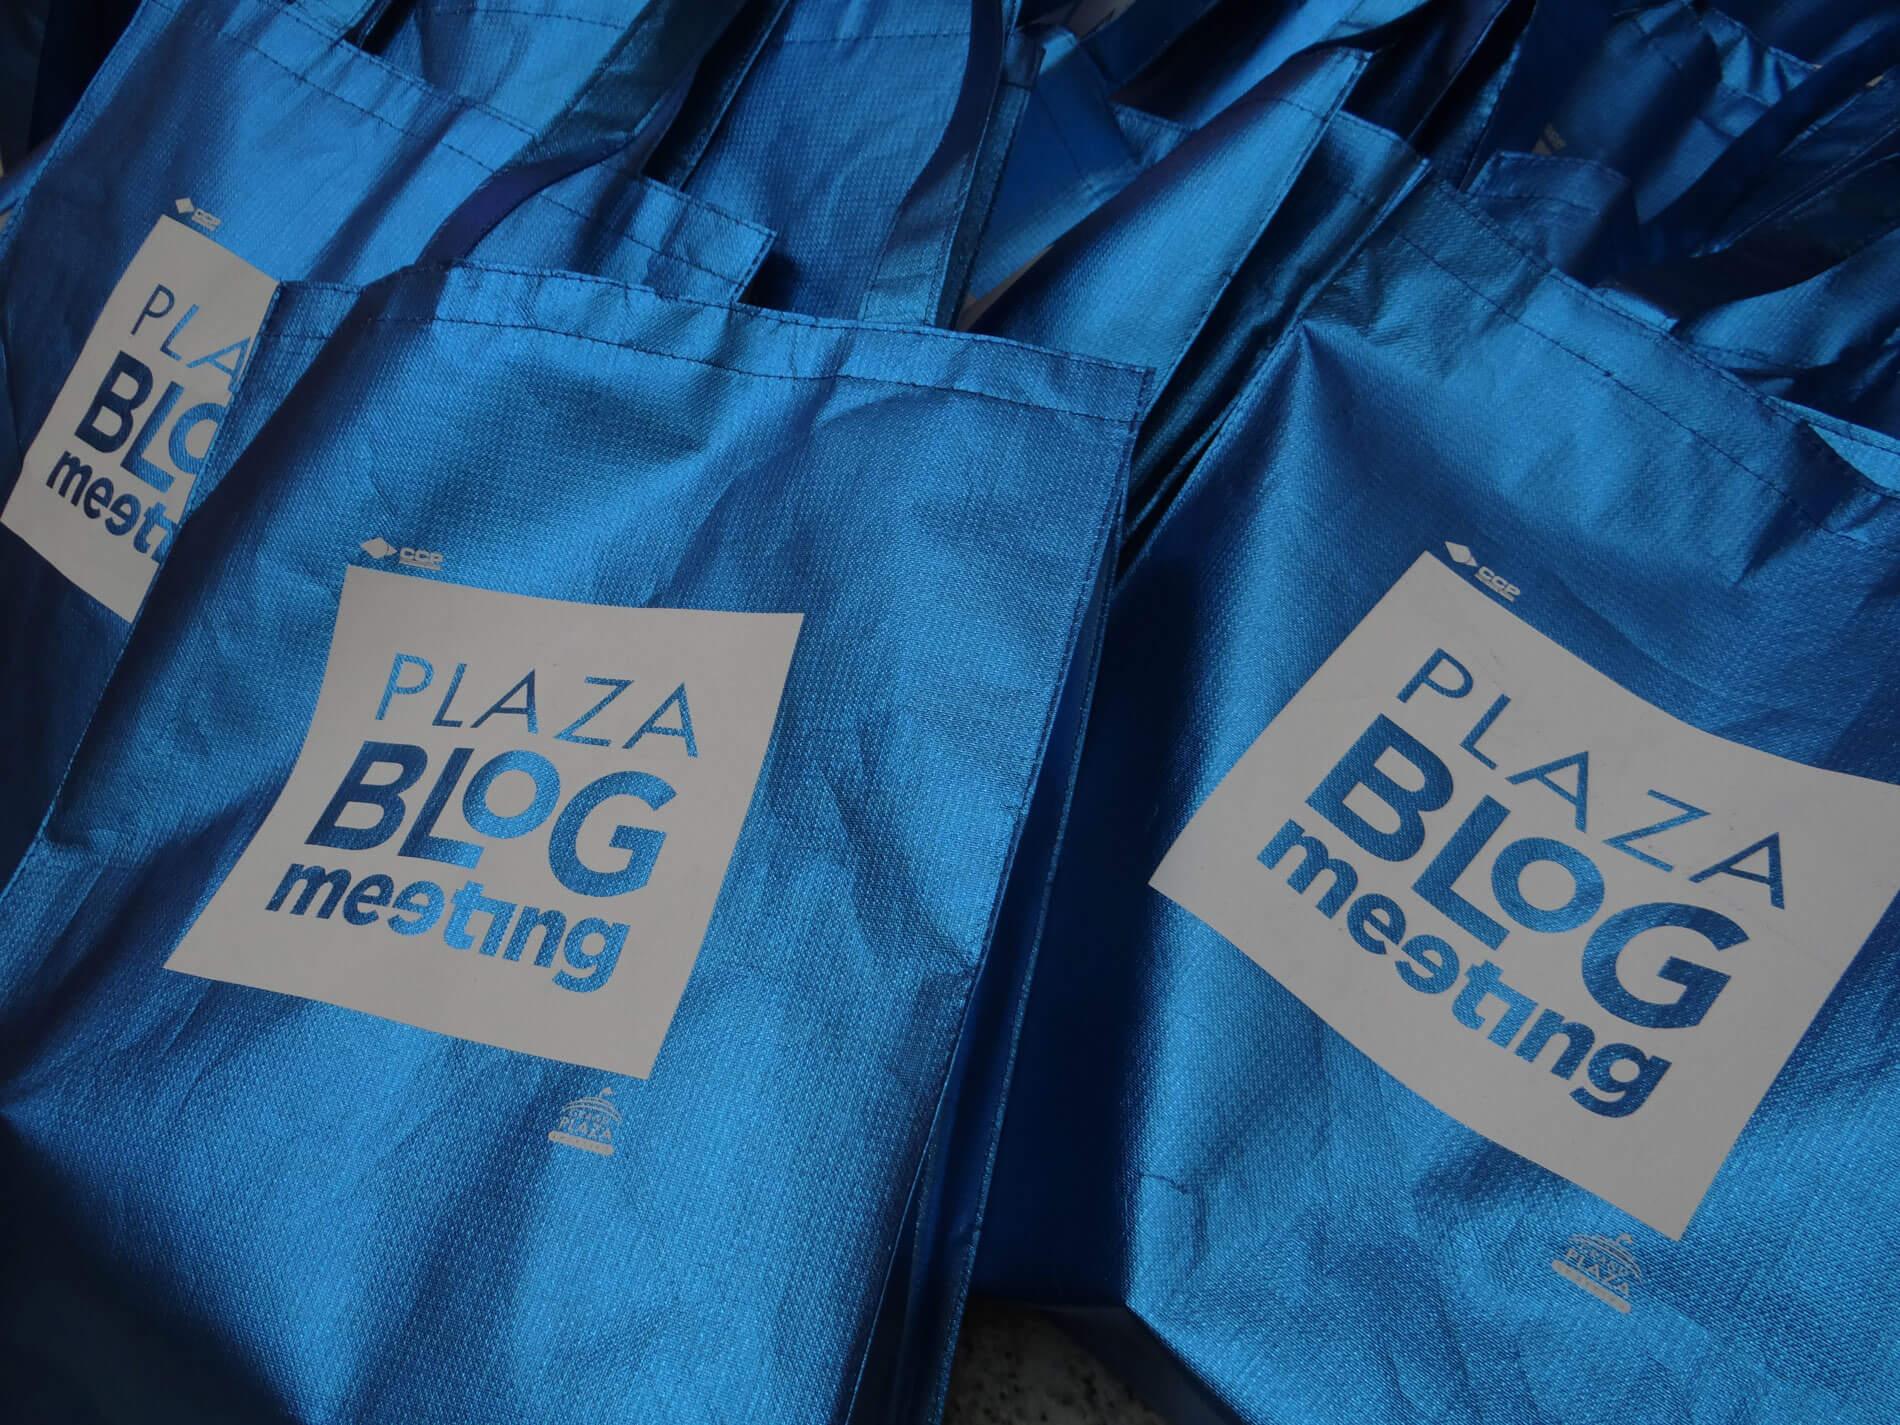 Plaza Blog Meeting